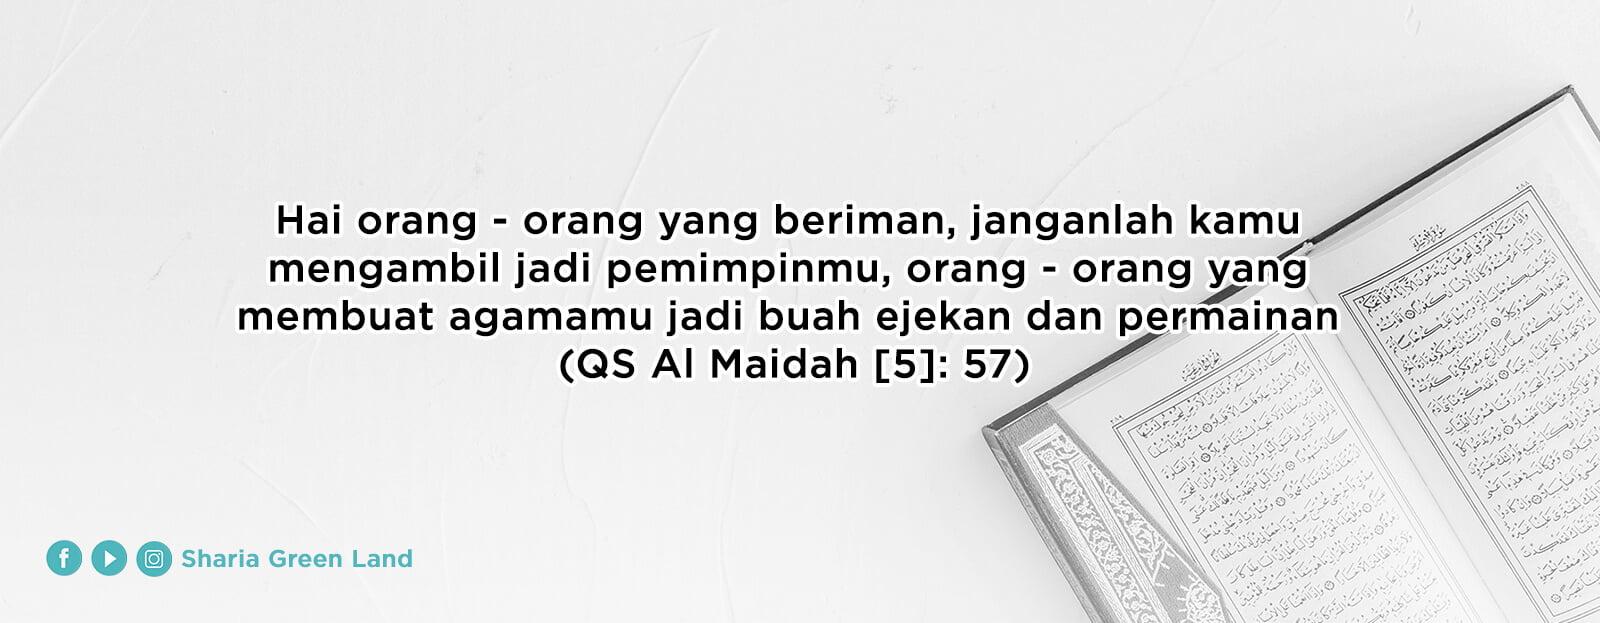 Al Qur'an tentang bercanda